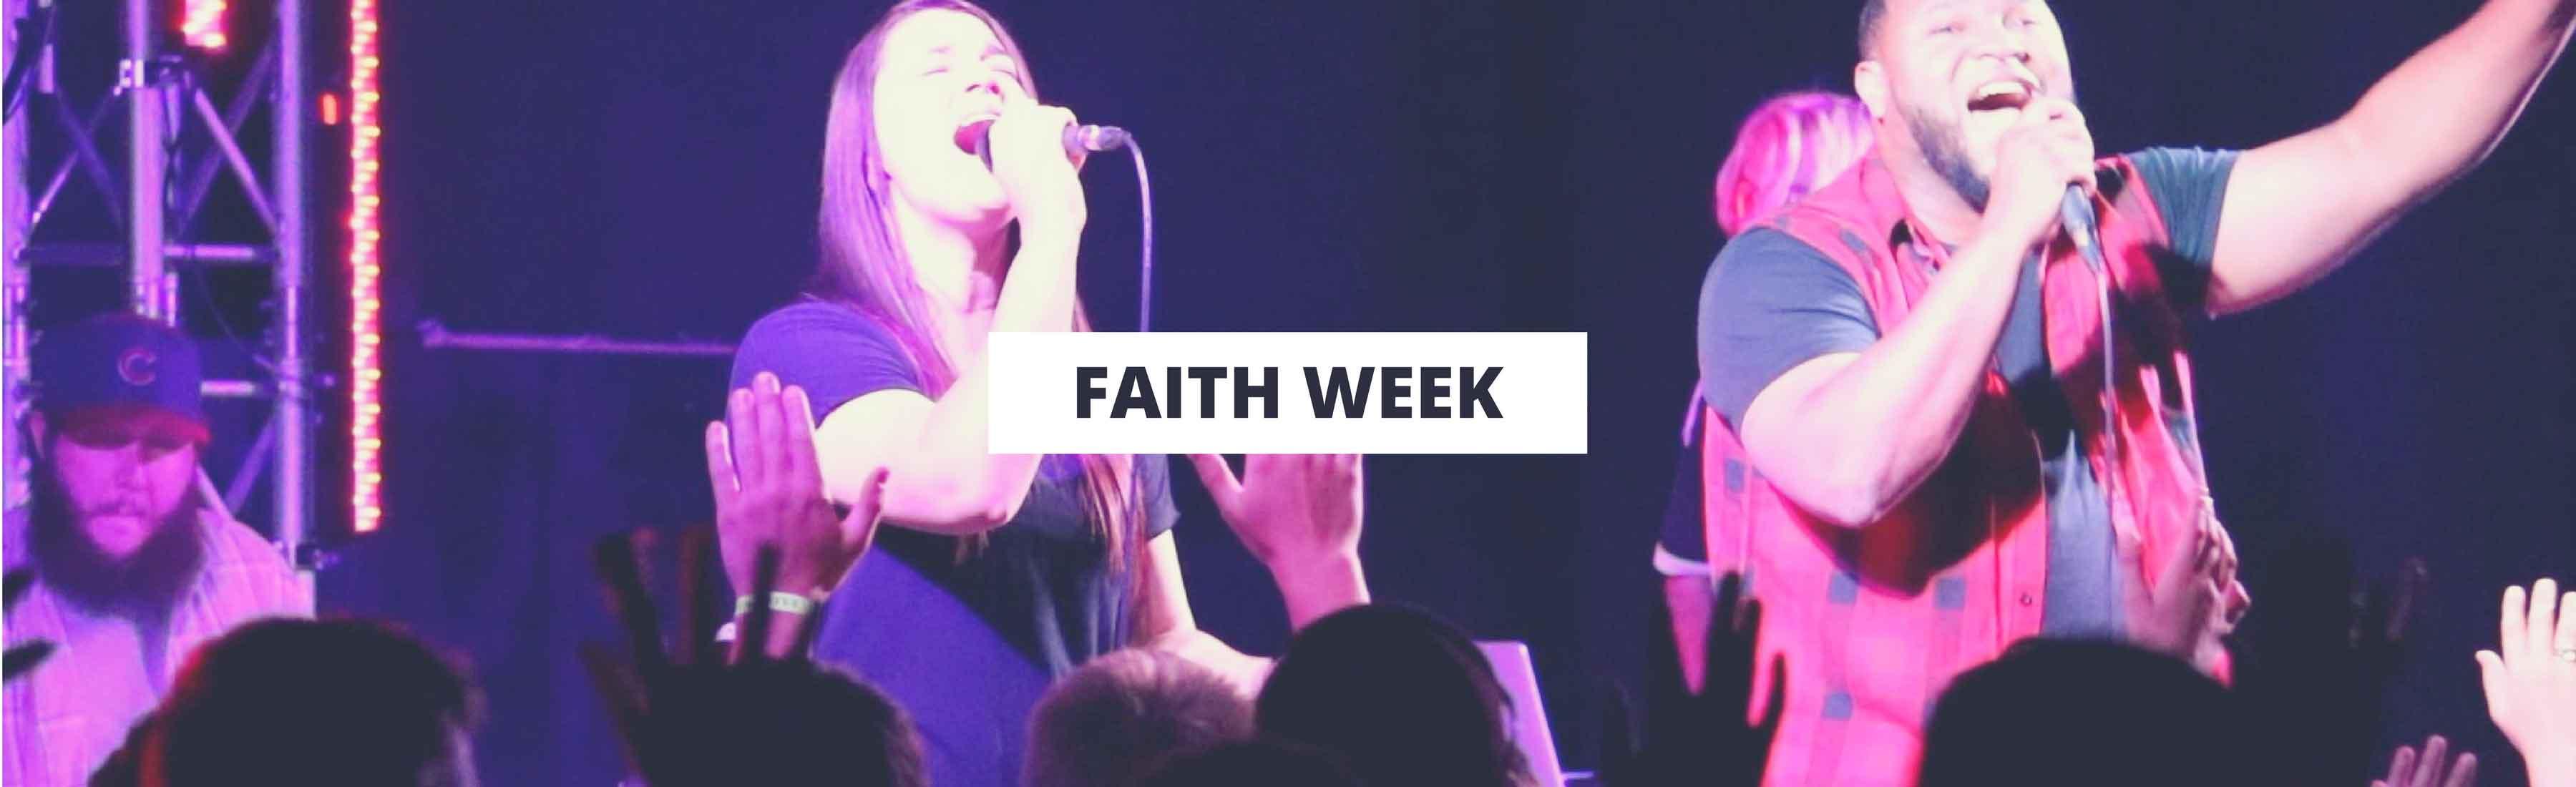 Faith-Week-Slider-low-res